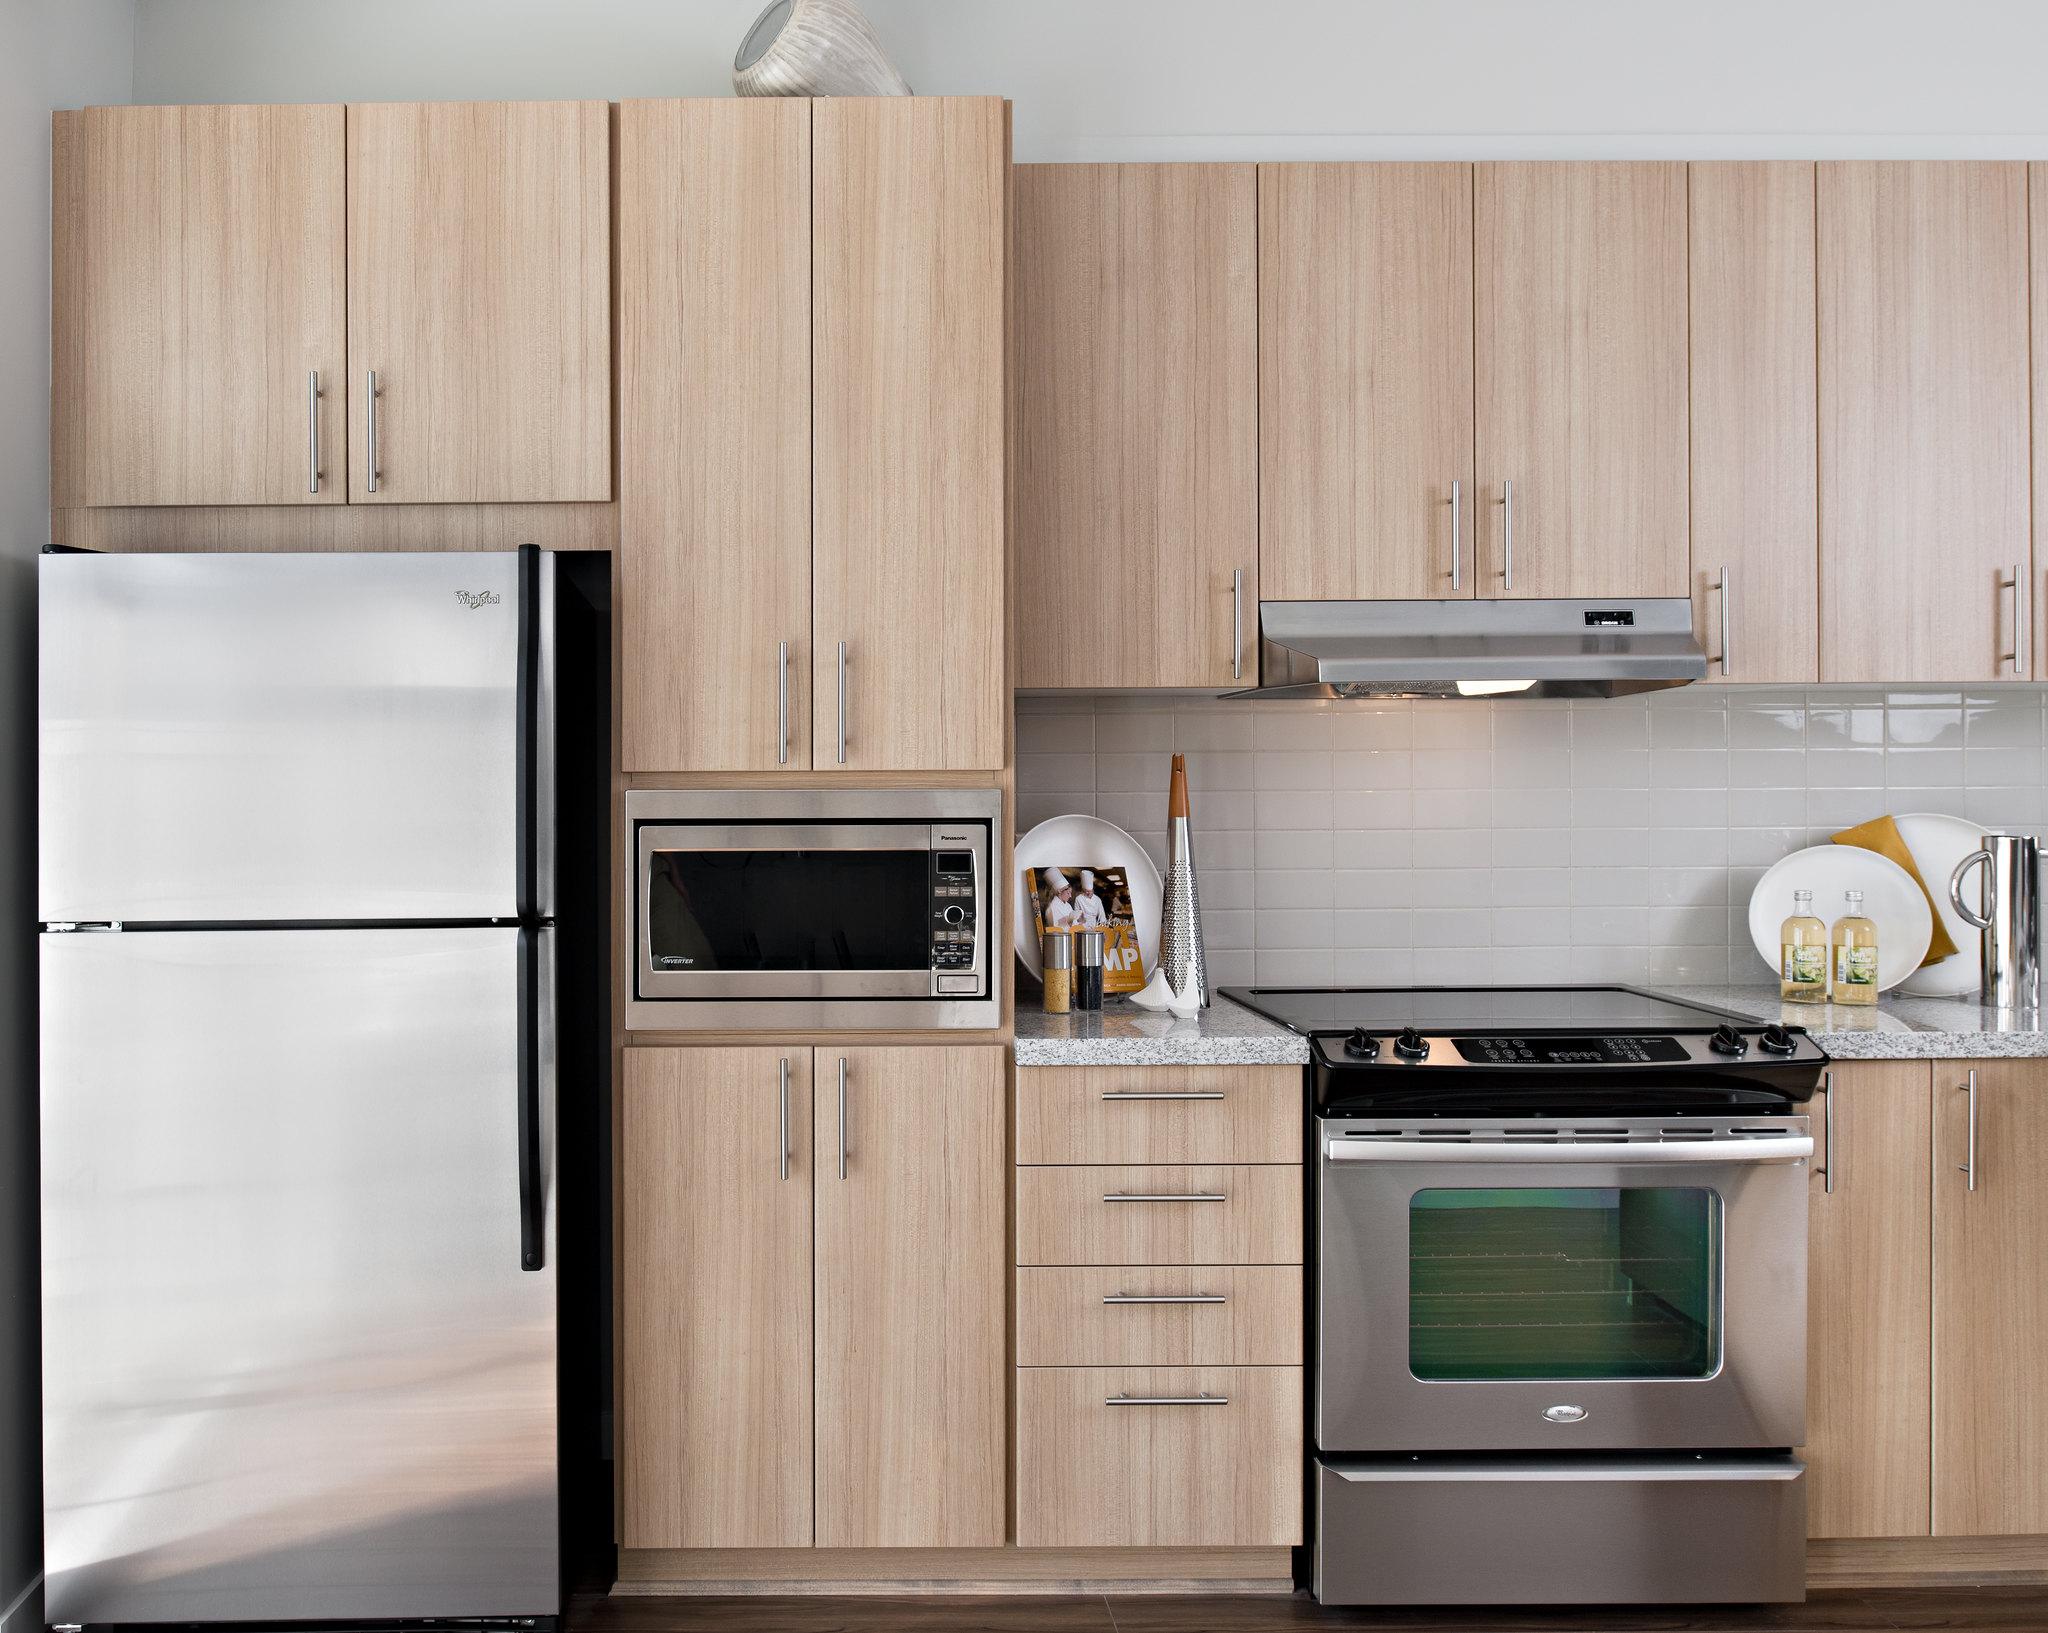 Outdoor Kitchen Appliance Ideas